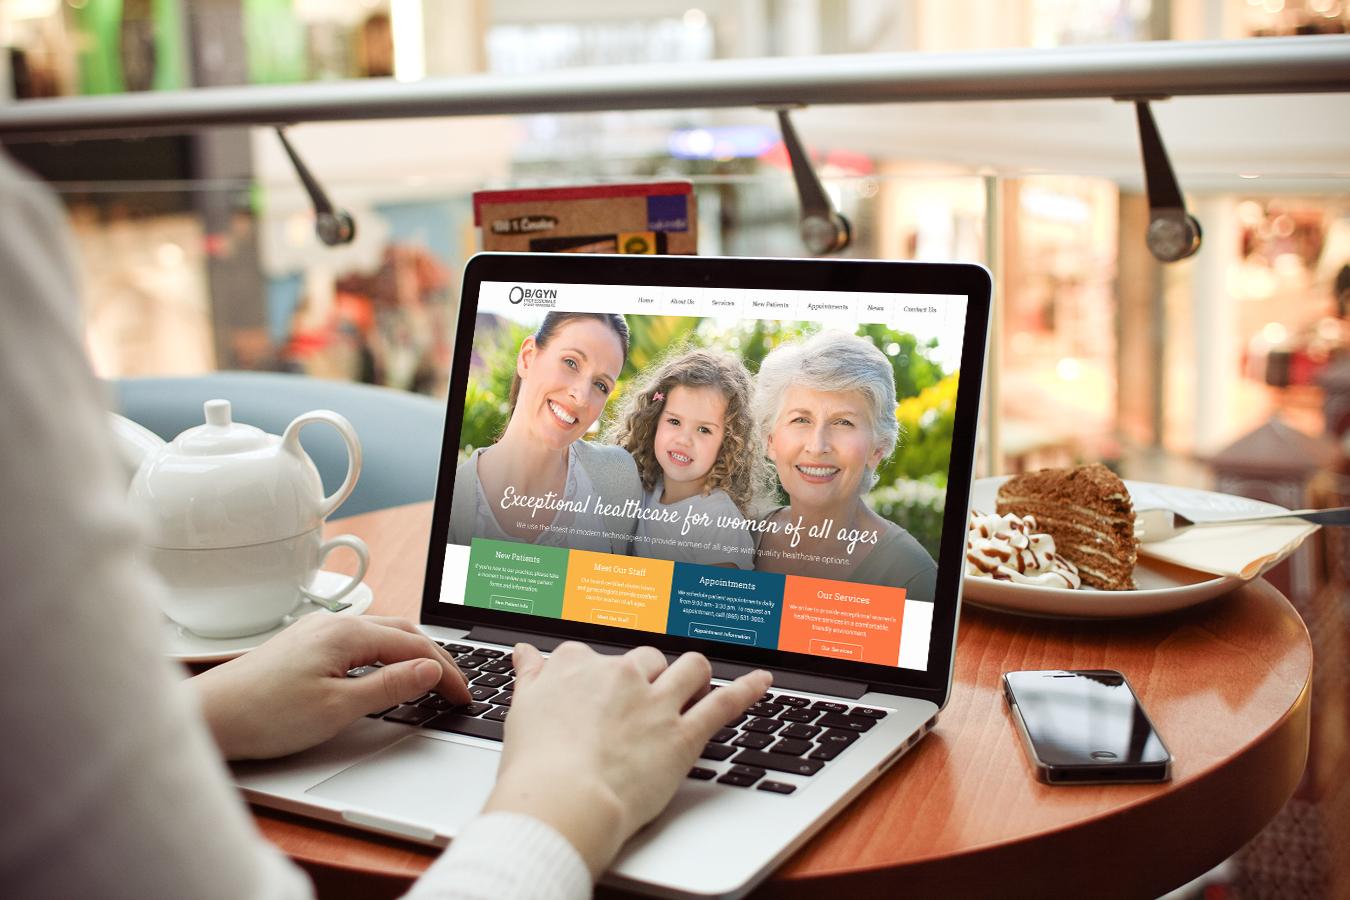 OB/GYN Professionals of East Tennessee Website    Services provided: Responsive Website Design & Development, Custom Wordpress Integration,Search Engine Optimization    Visit Site